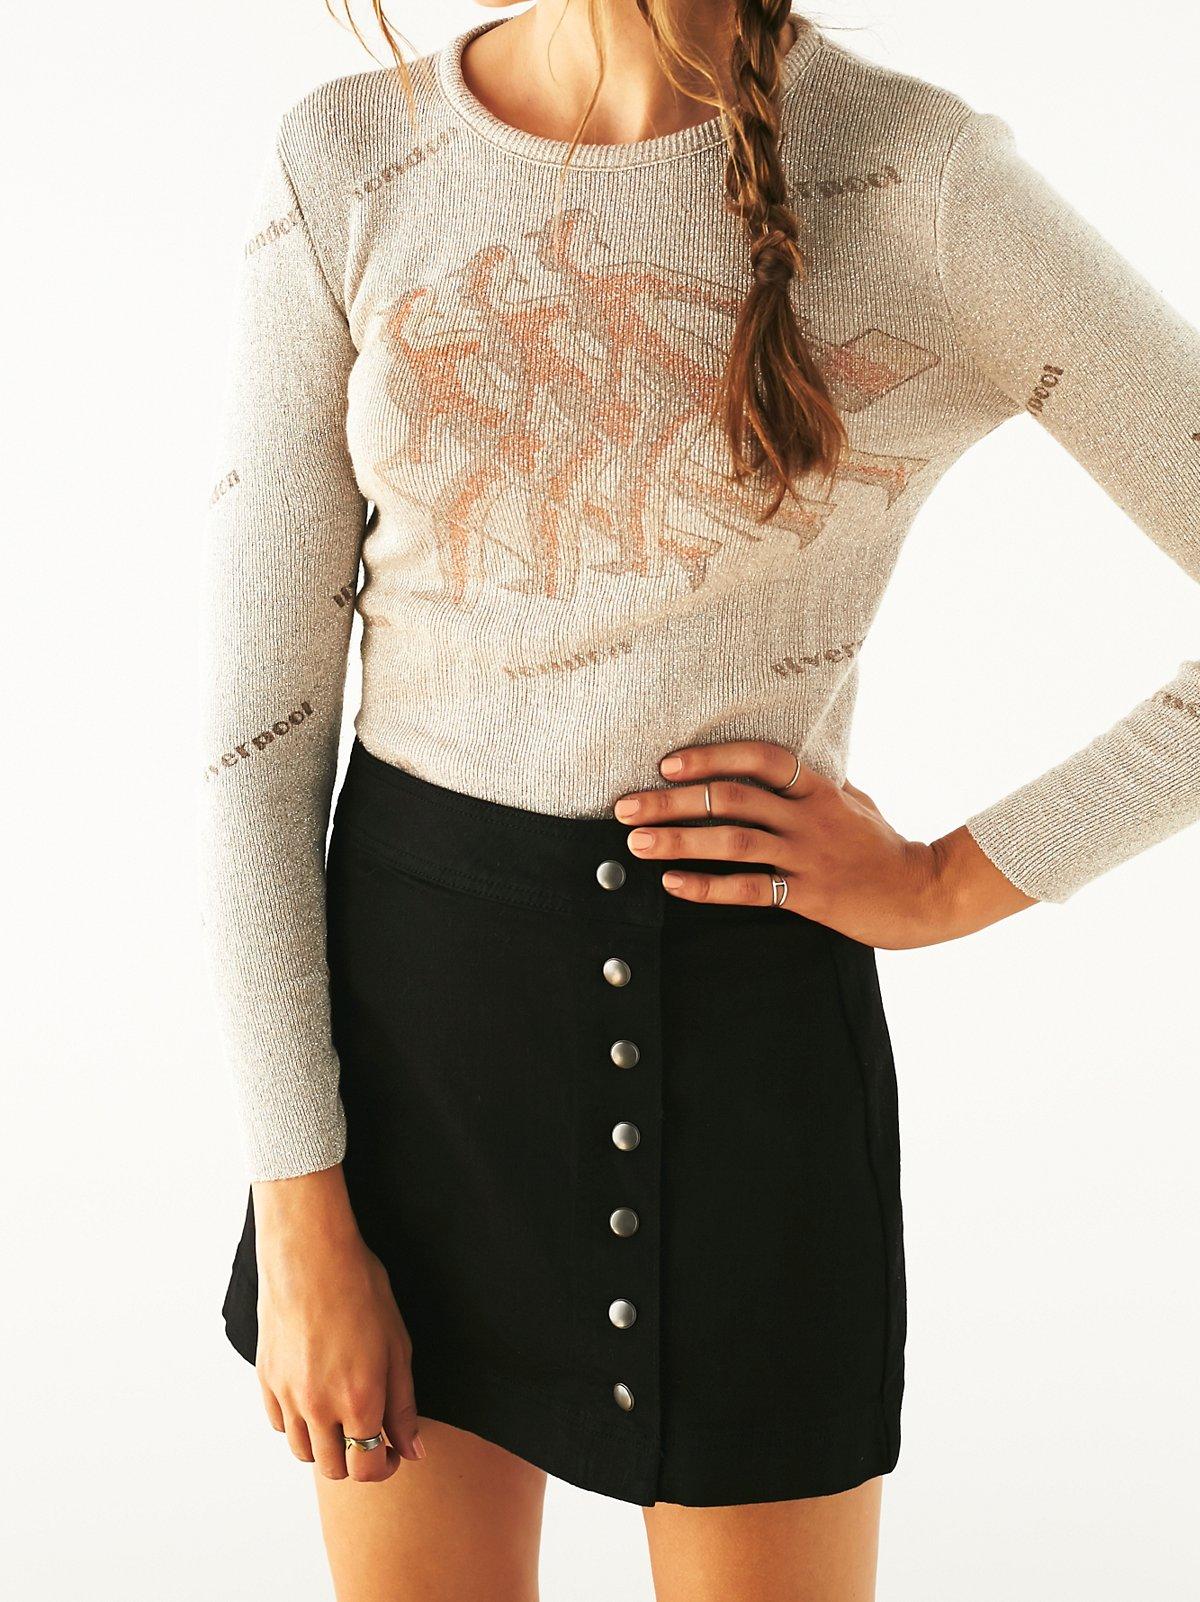 Vintage Metallic England Sweater